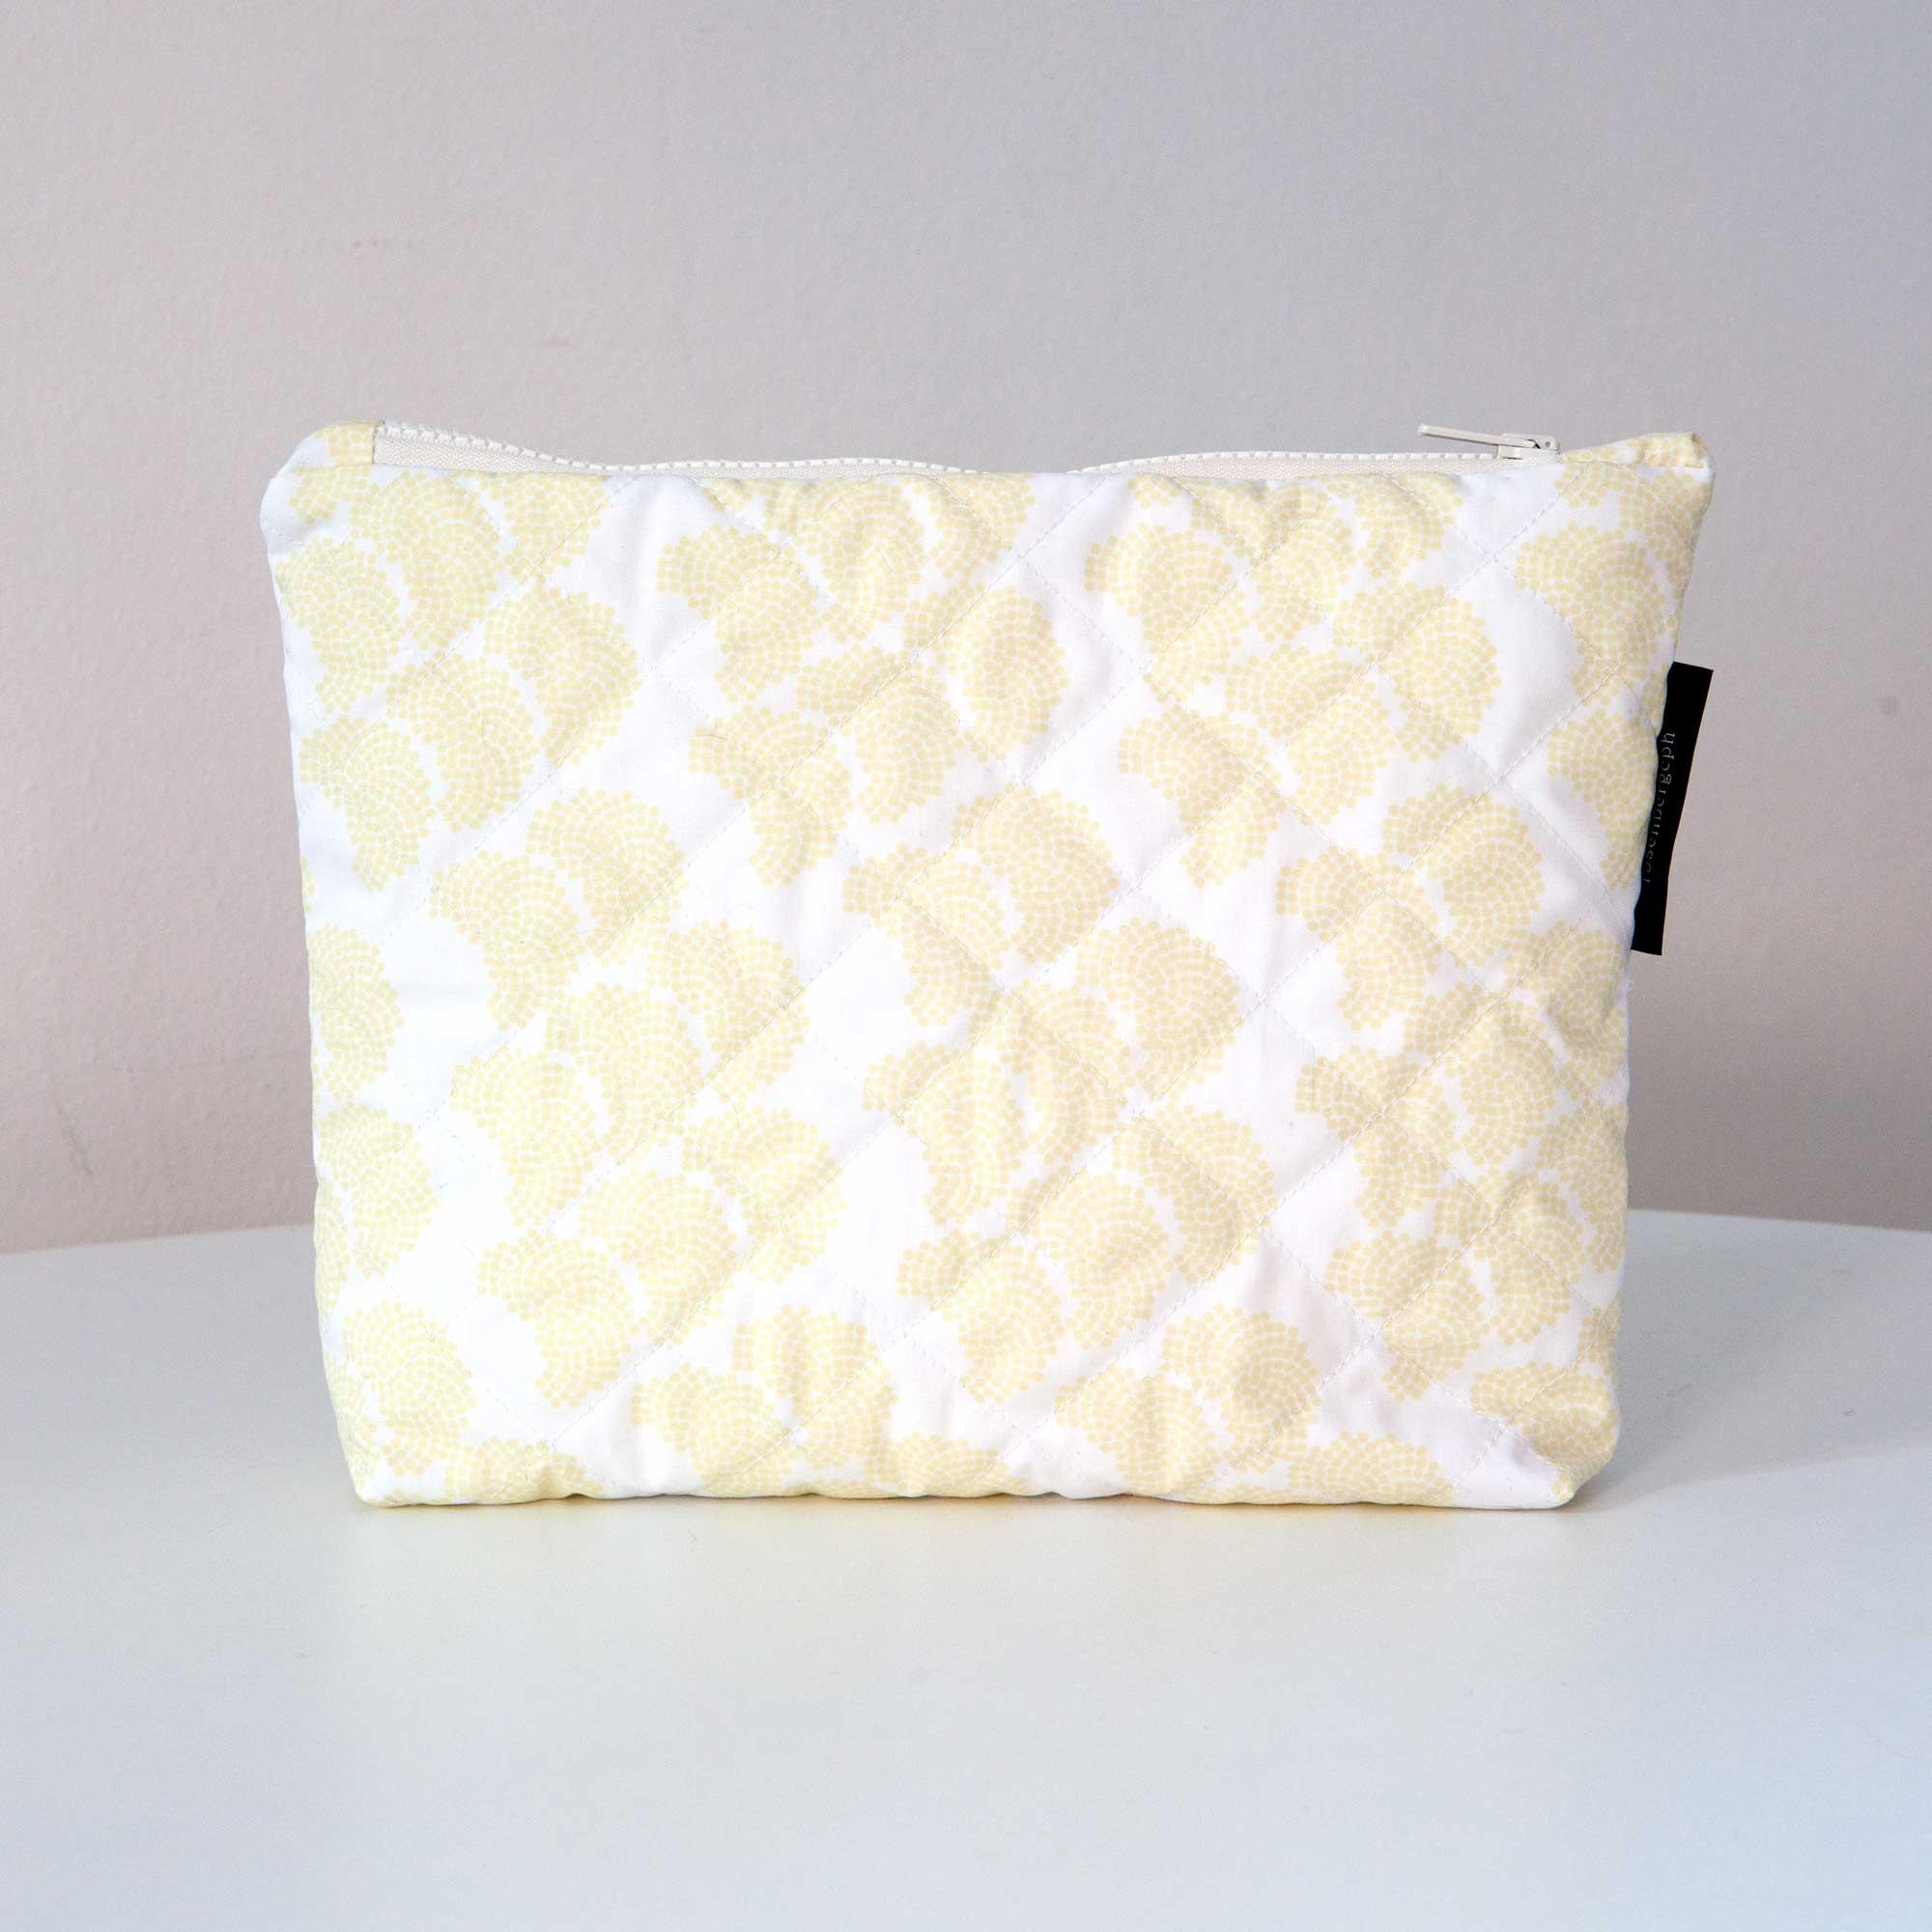 Ctrl purse, obi yellow organic cotton, design by Anne Rosenberg, RosenbergCph